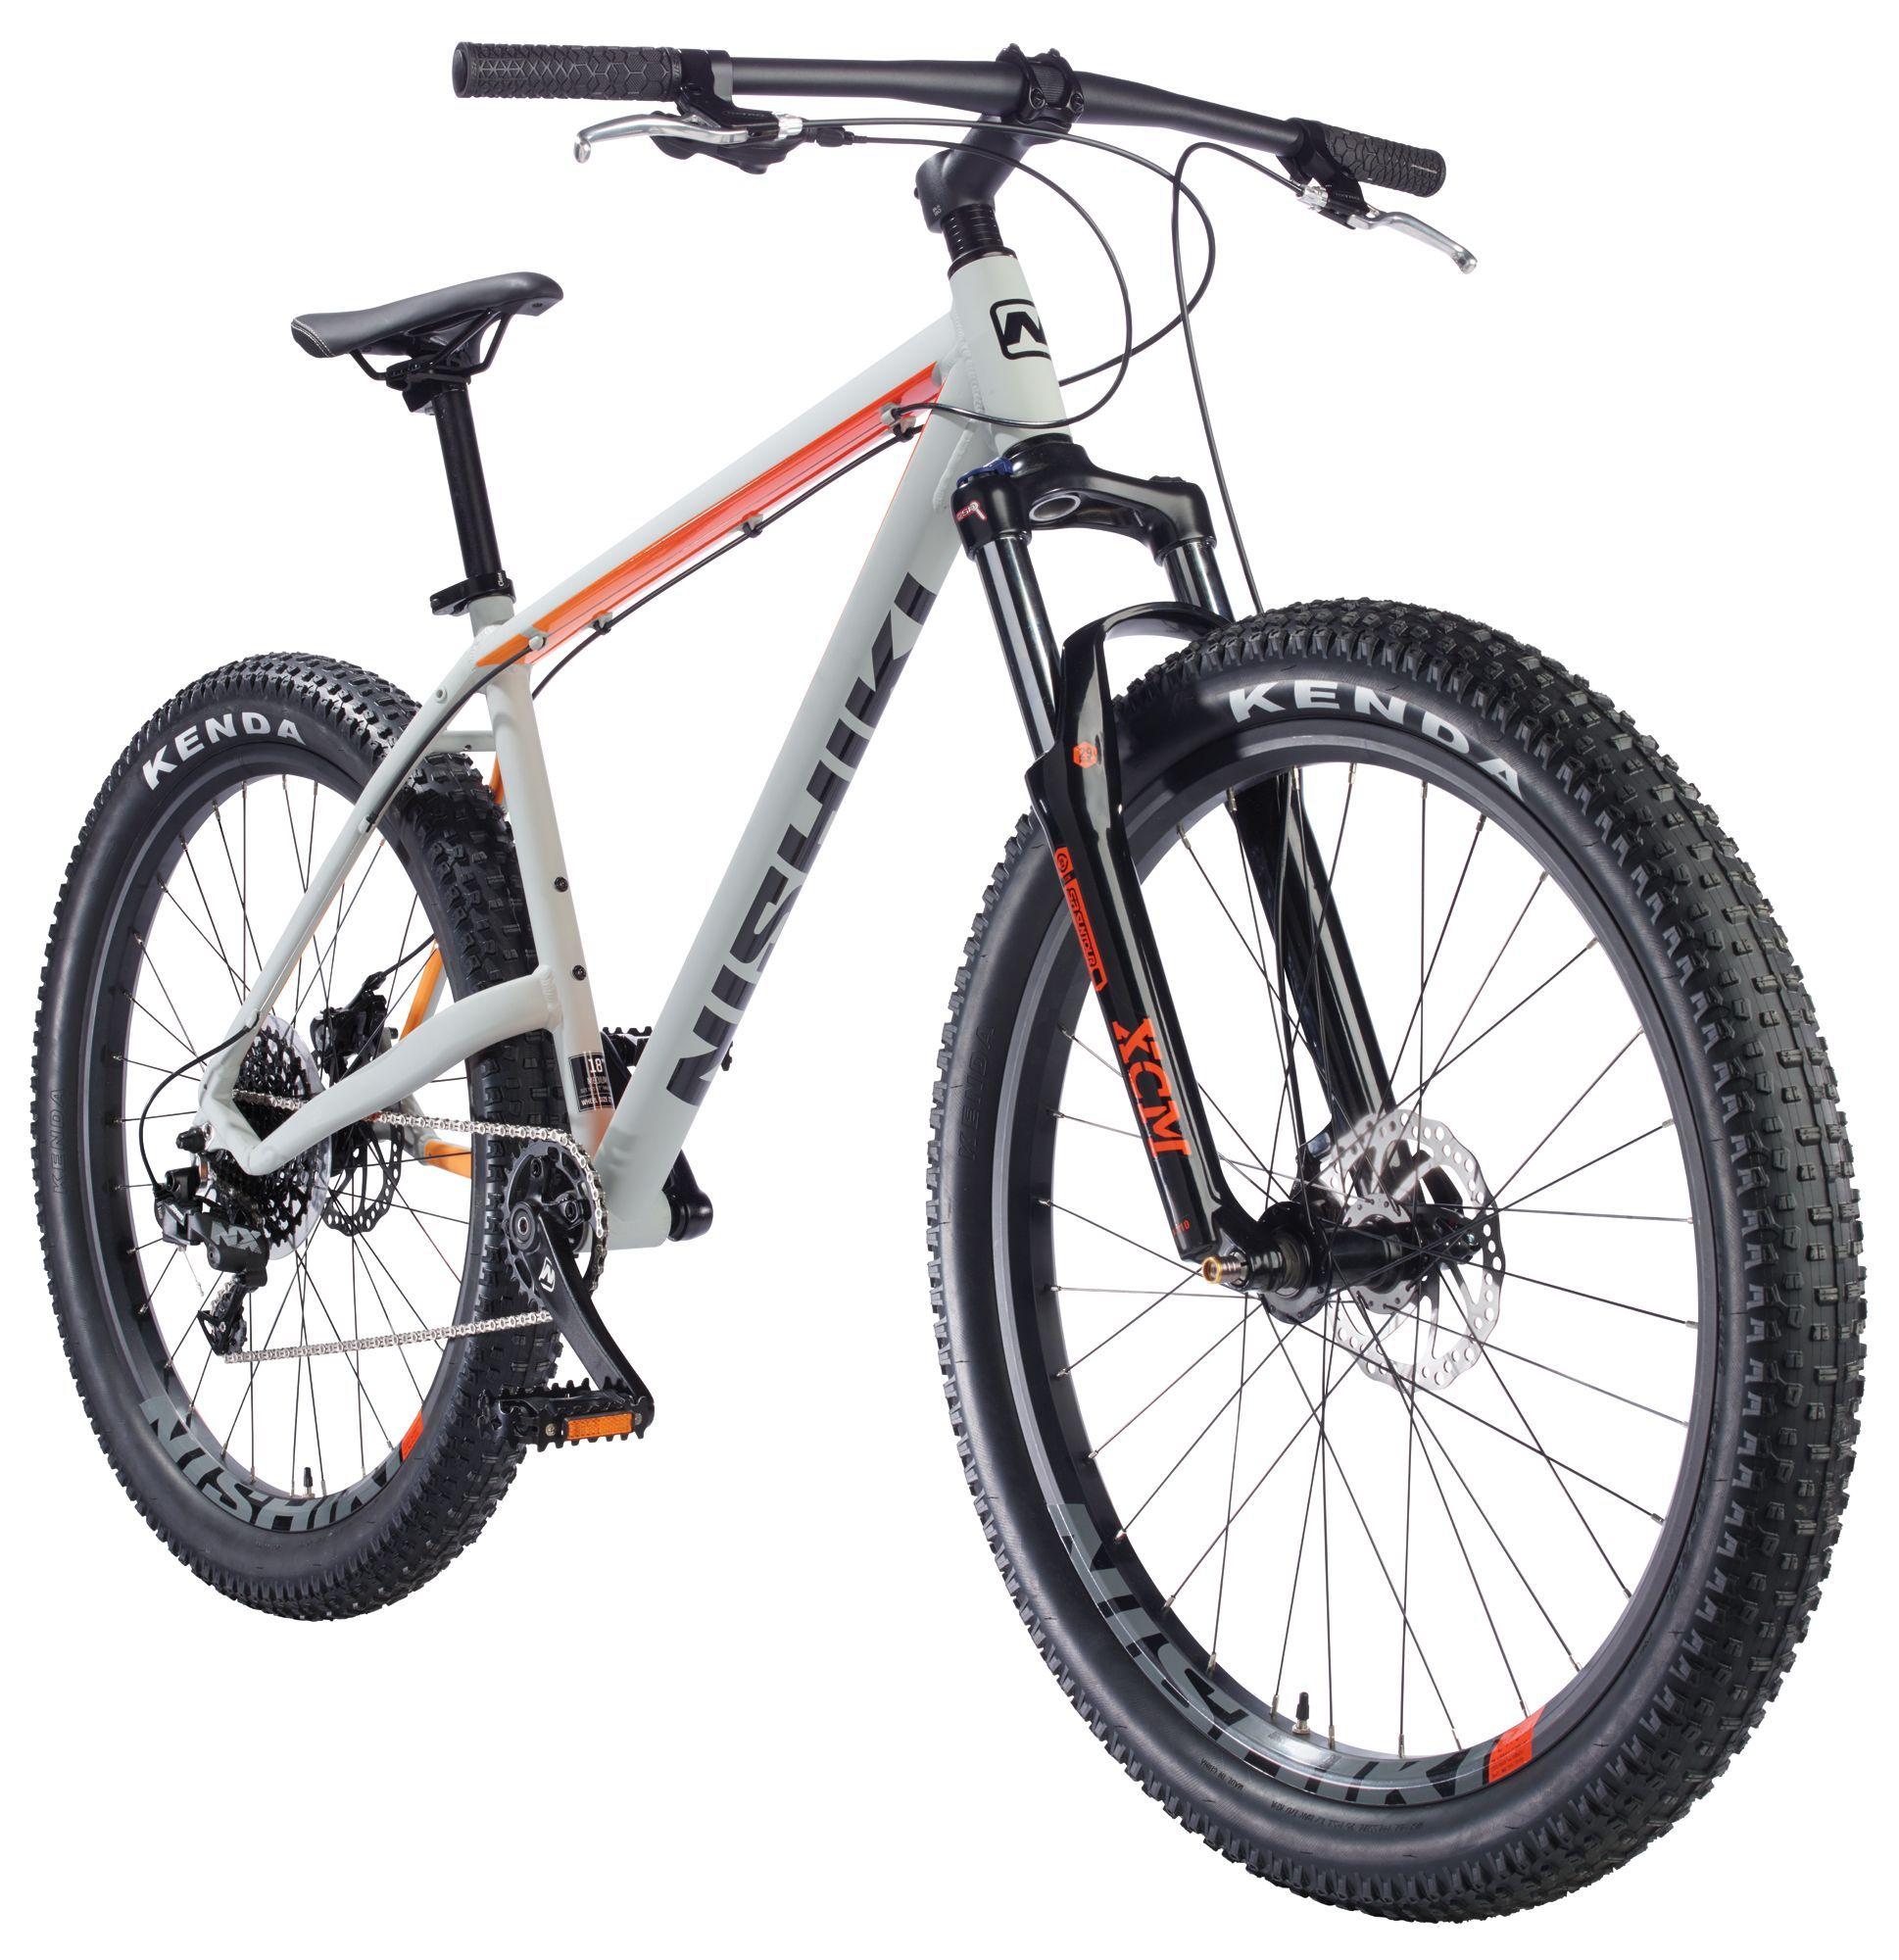 e19adeab365 Nishiki Men's Colorado Comp 1X 27.5+ Mountain Bike | Products ...